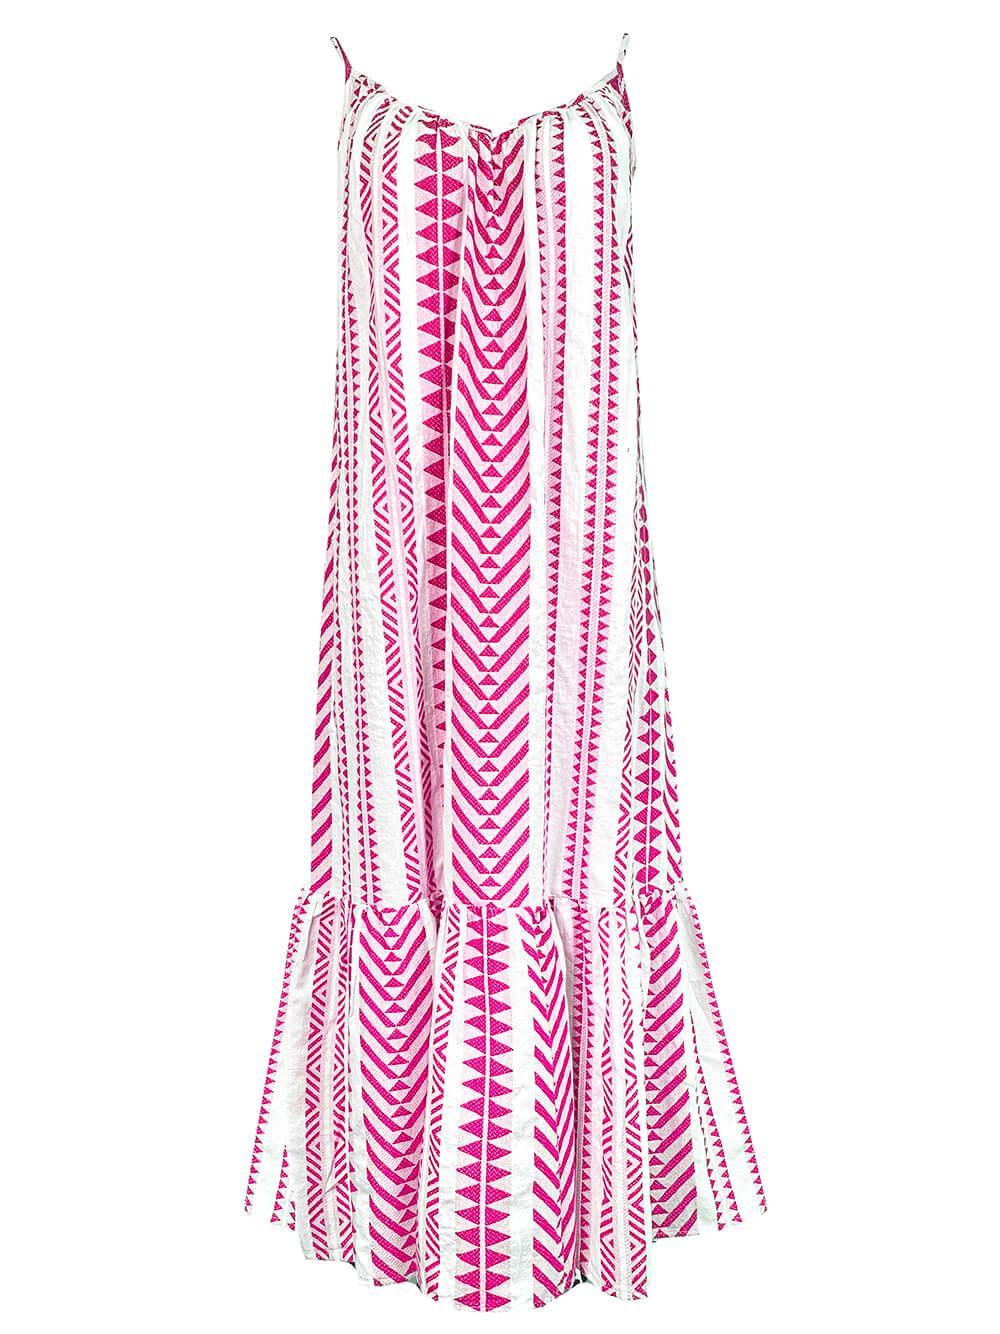 Dinae Jacquard Tiered Dress